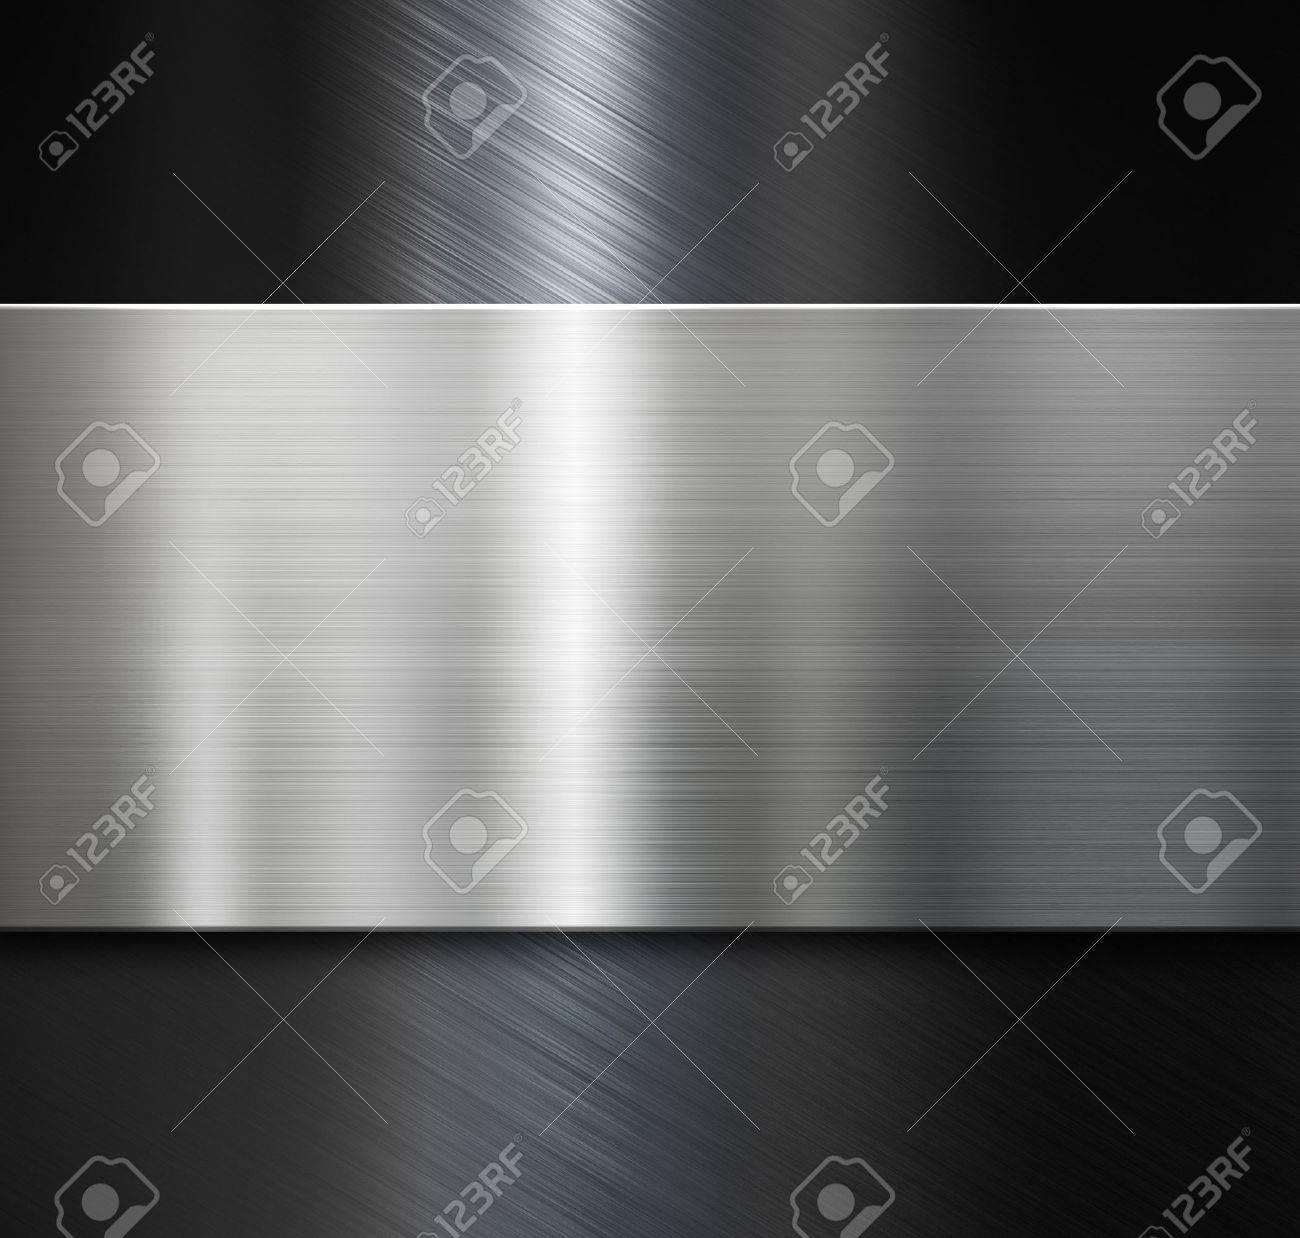 metal plate over black